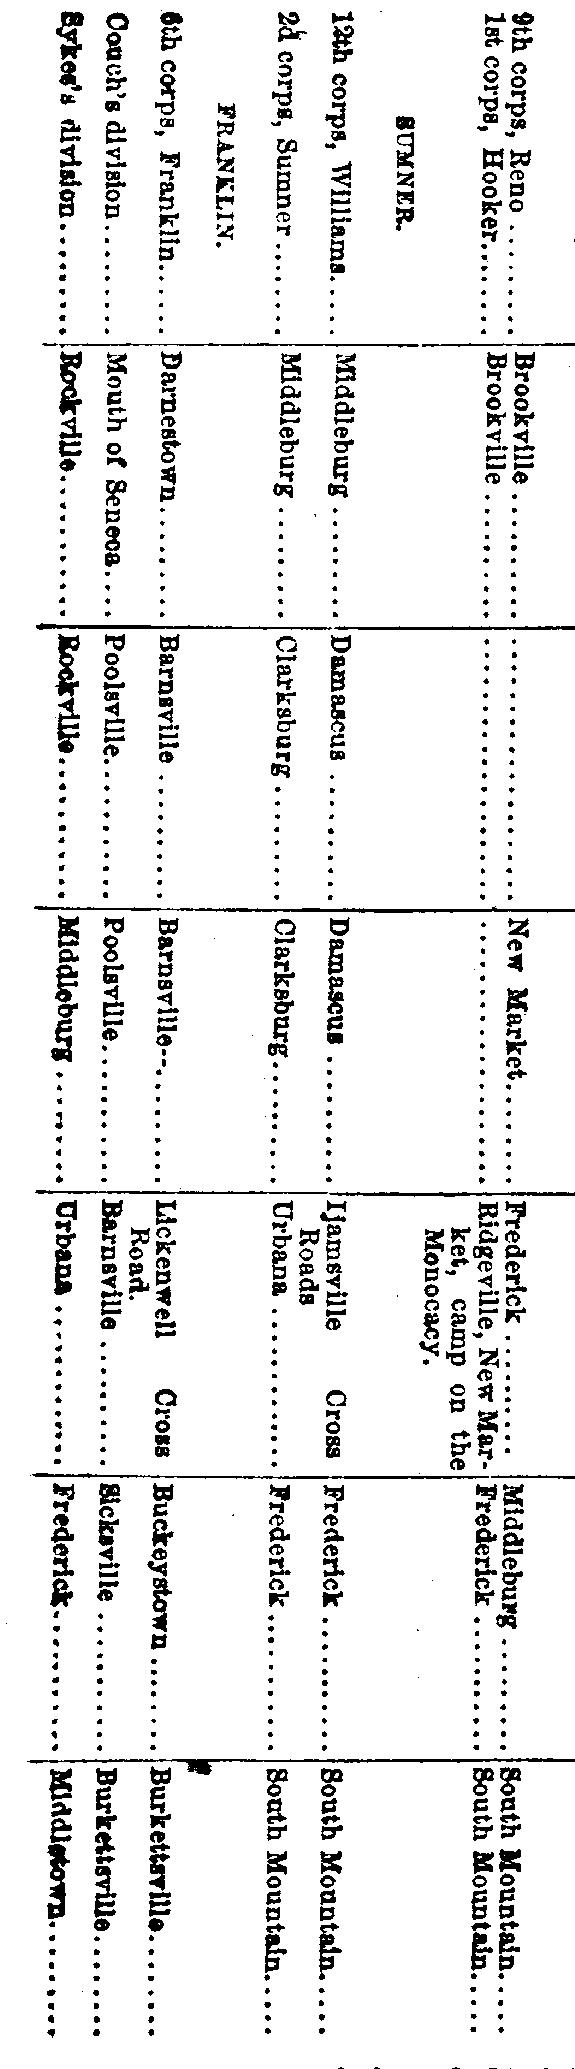 [ocr errors][ocr errors][ocr errors][graphic][merged small][ocr errors][ocr errors][ocr errors][ocr errors][ocr errors][ocr errors][ocr errors][merged small][merged small][graphic][ocr errors][merged small]